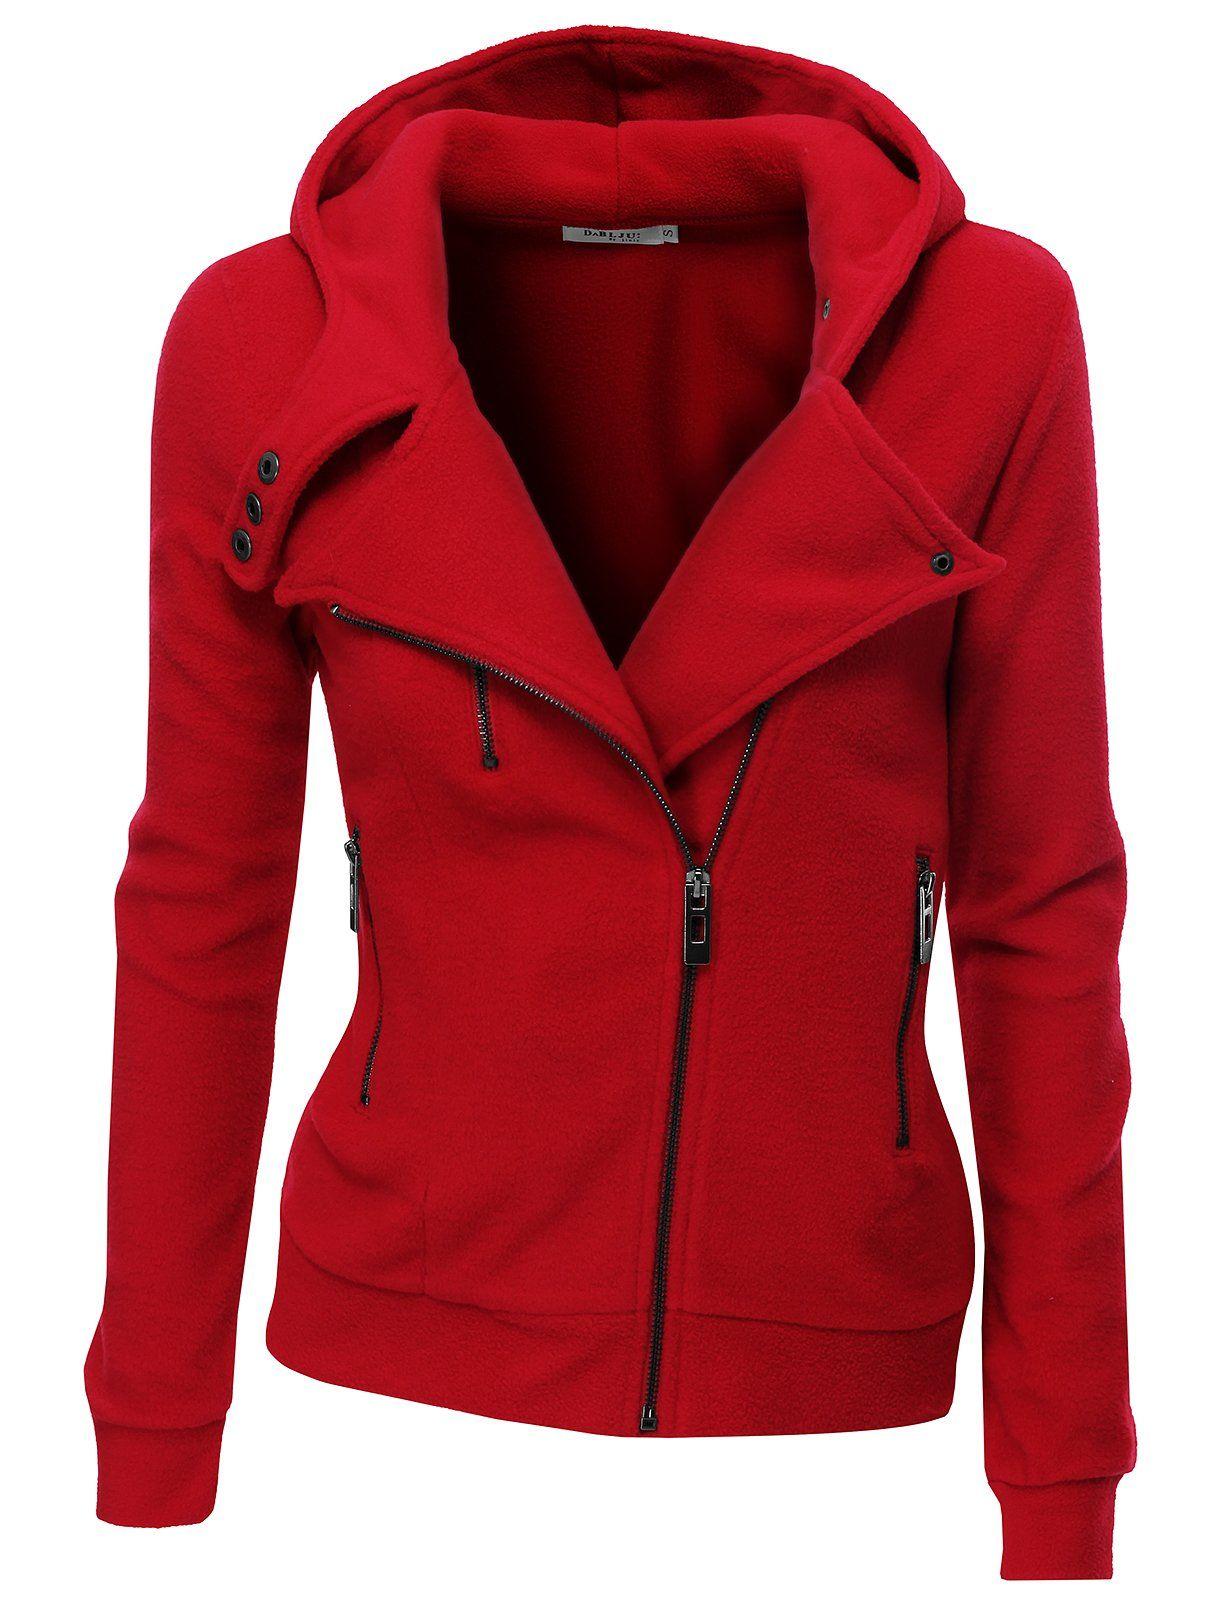 Doublju Women s Fleece Zip-Up High Neck Jacket at Amazon Women s Clothing  store  Fleece Outerwear Jackets 3cc94d761